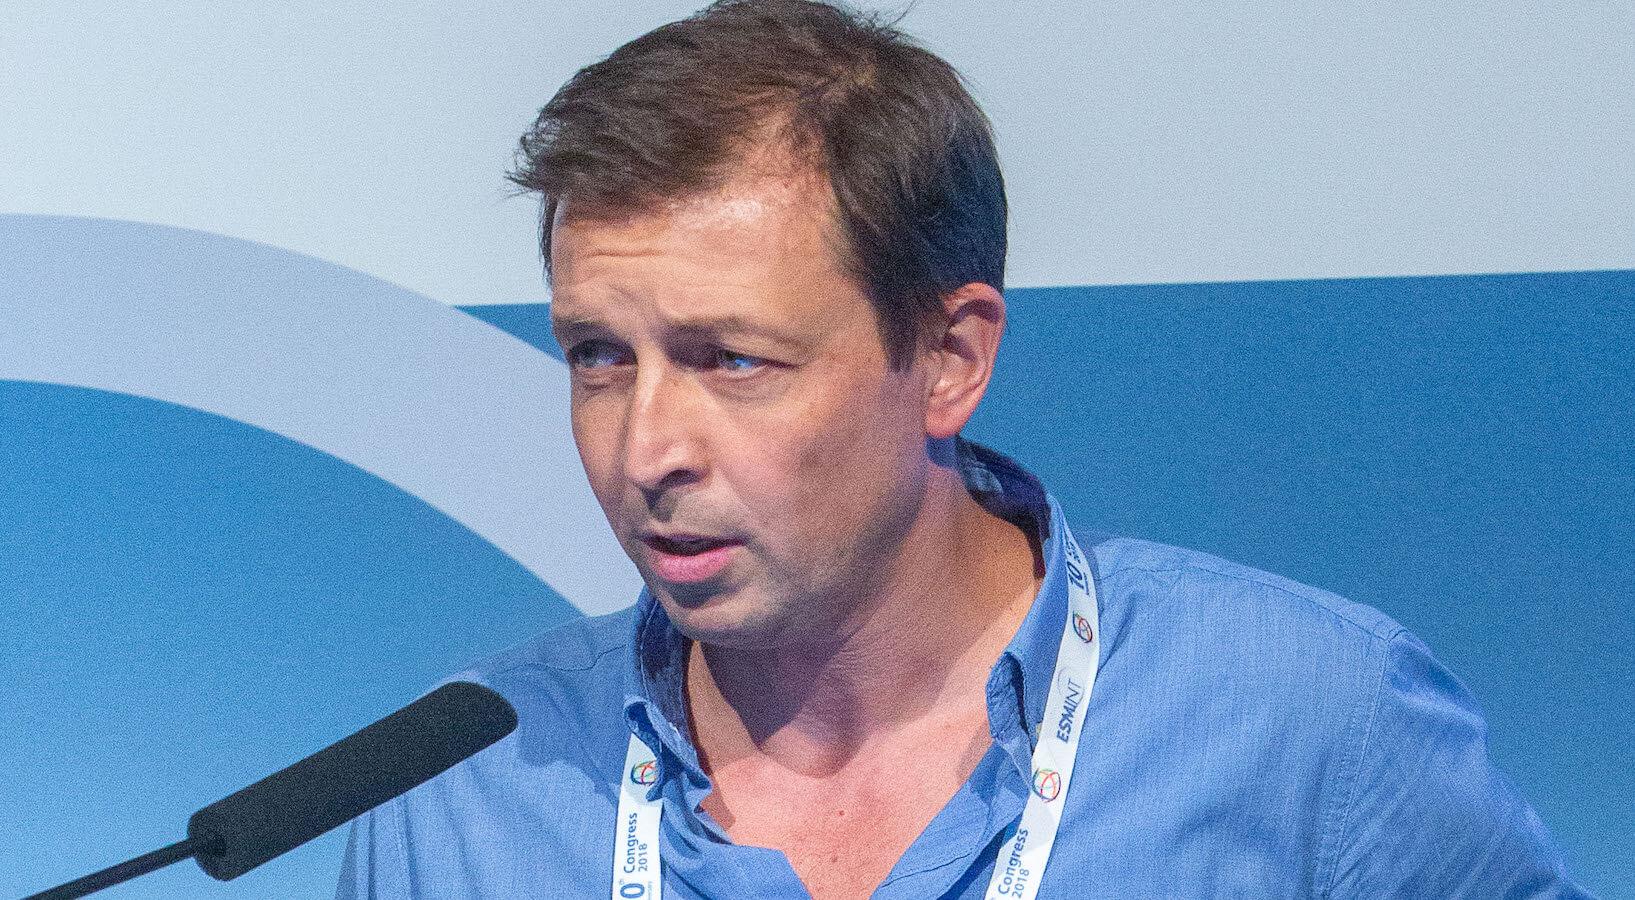 Zsolt Kulcsar belongs to the ESMINT ExCom.